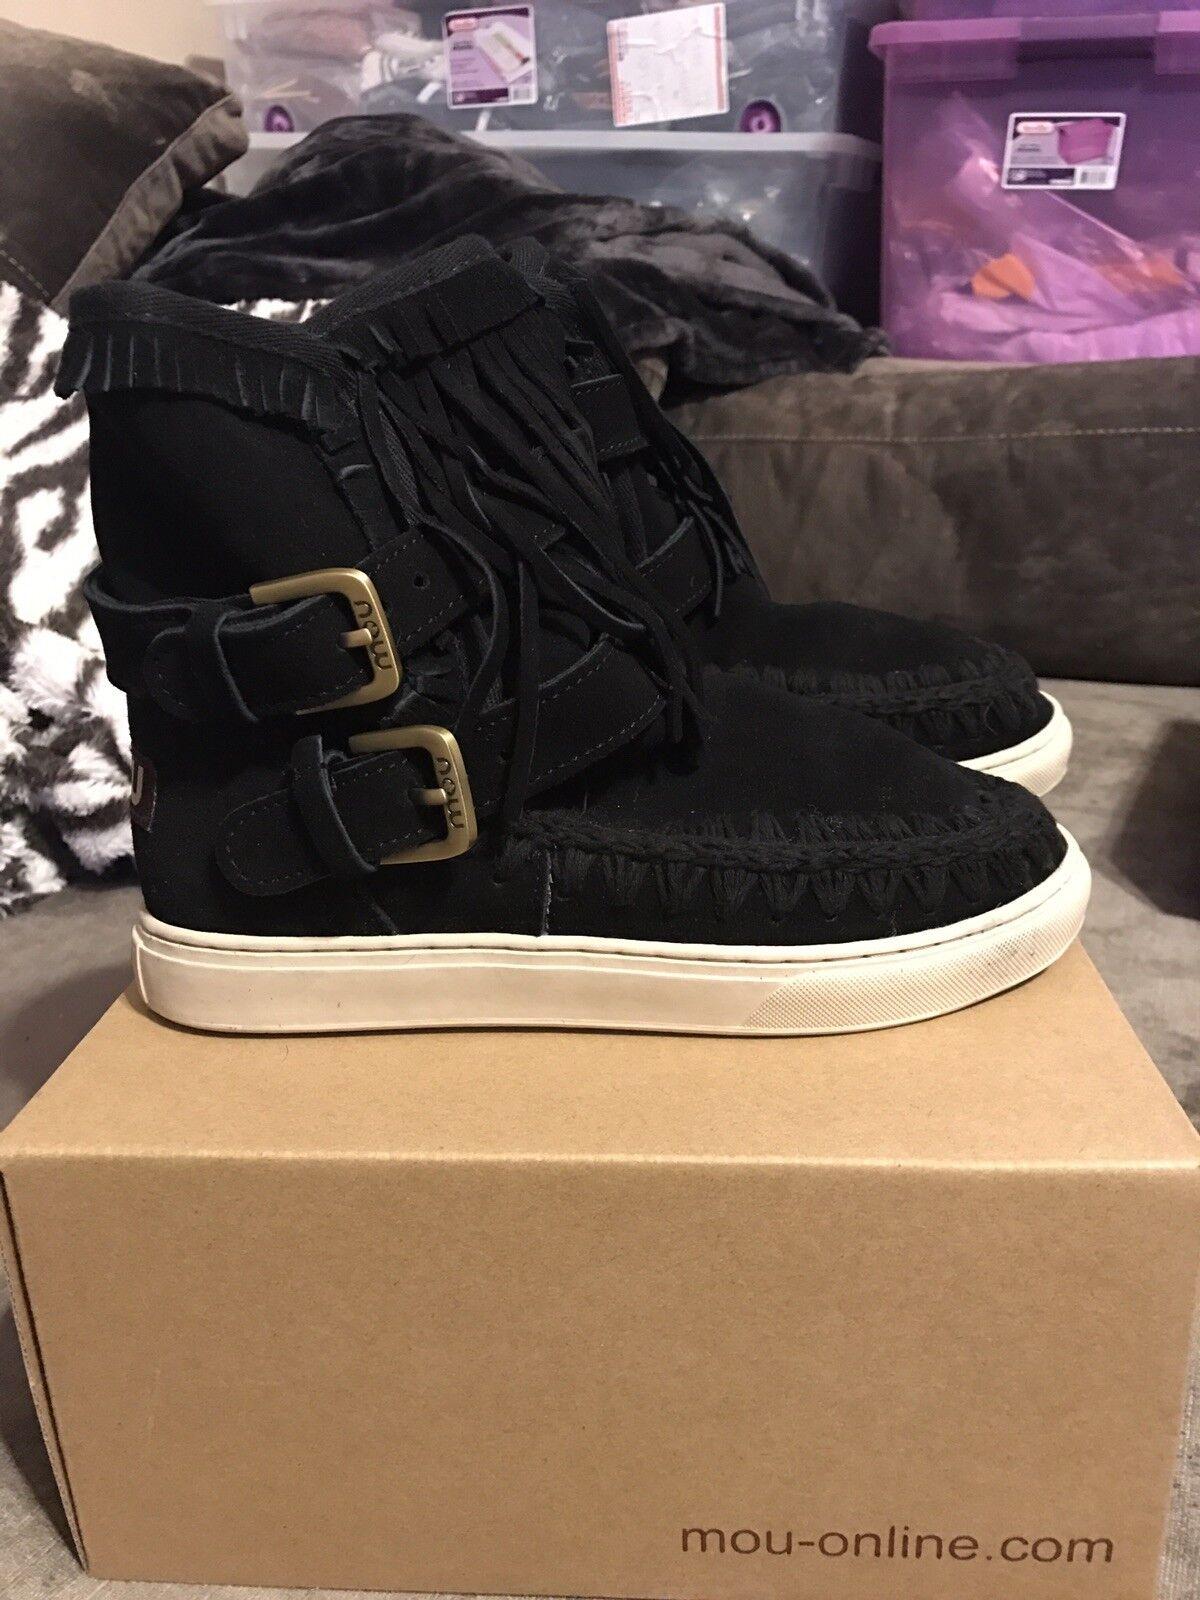 Mou Eskimo Sneaker Boot Fringes & Buckles Buckles Buckles Black Suede 36 38 39 40 All Sizes ef1340